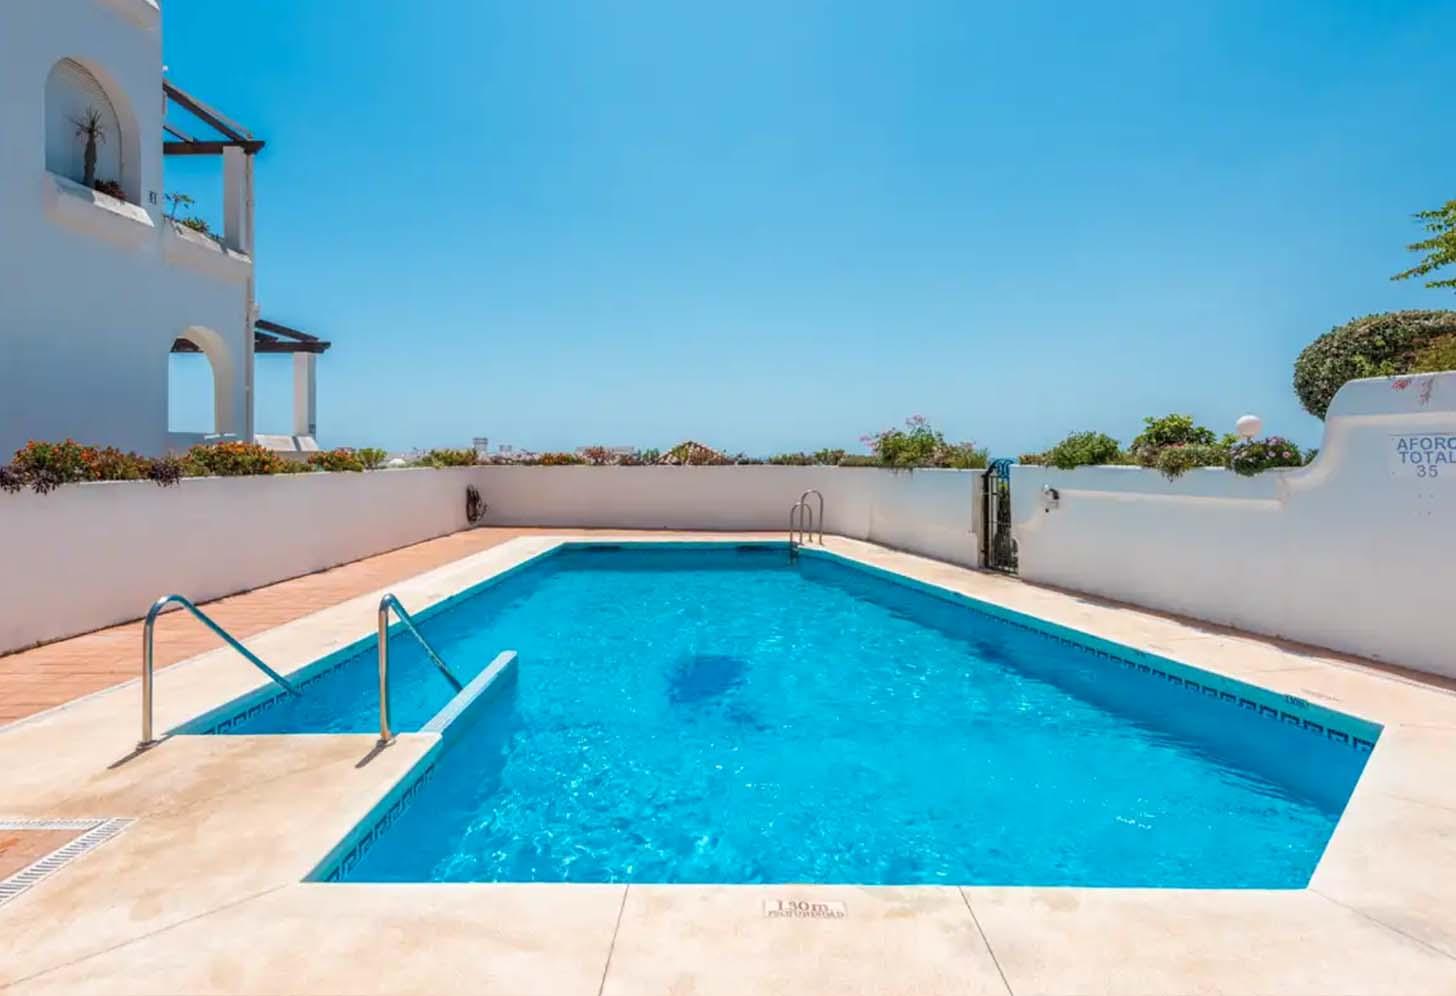 acheter un appartement piscine riviera del sol 009